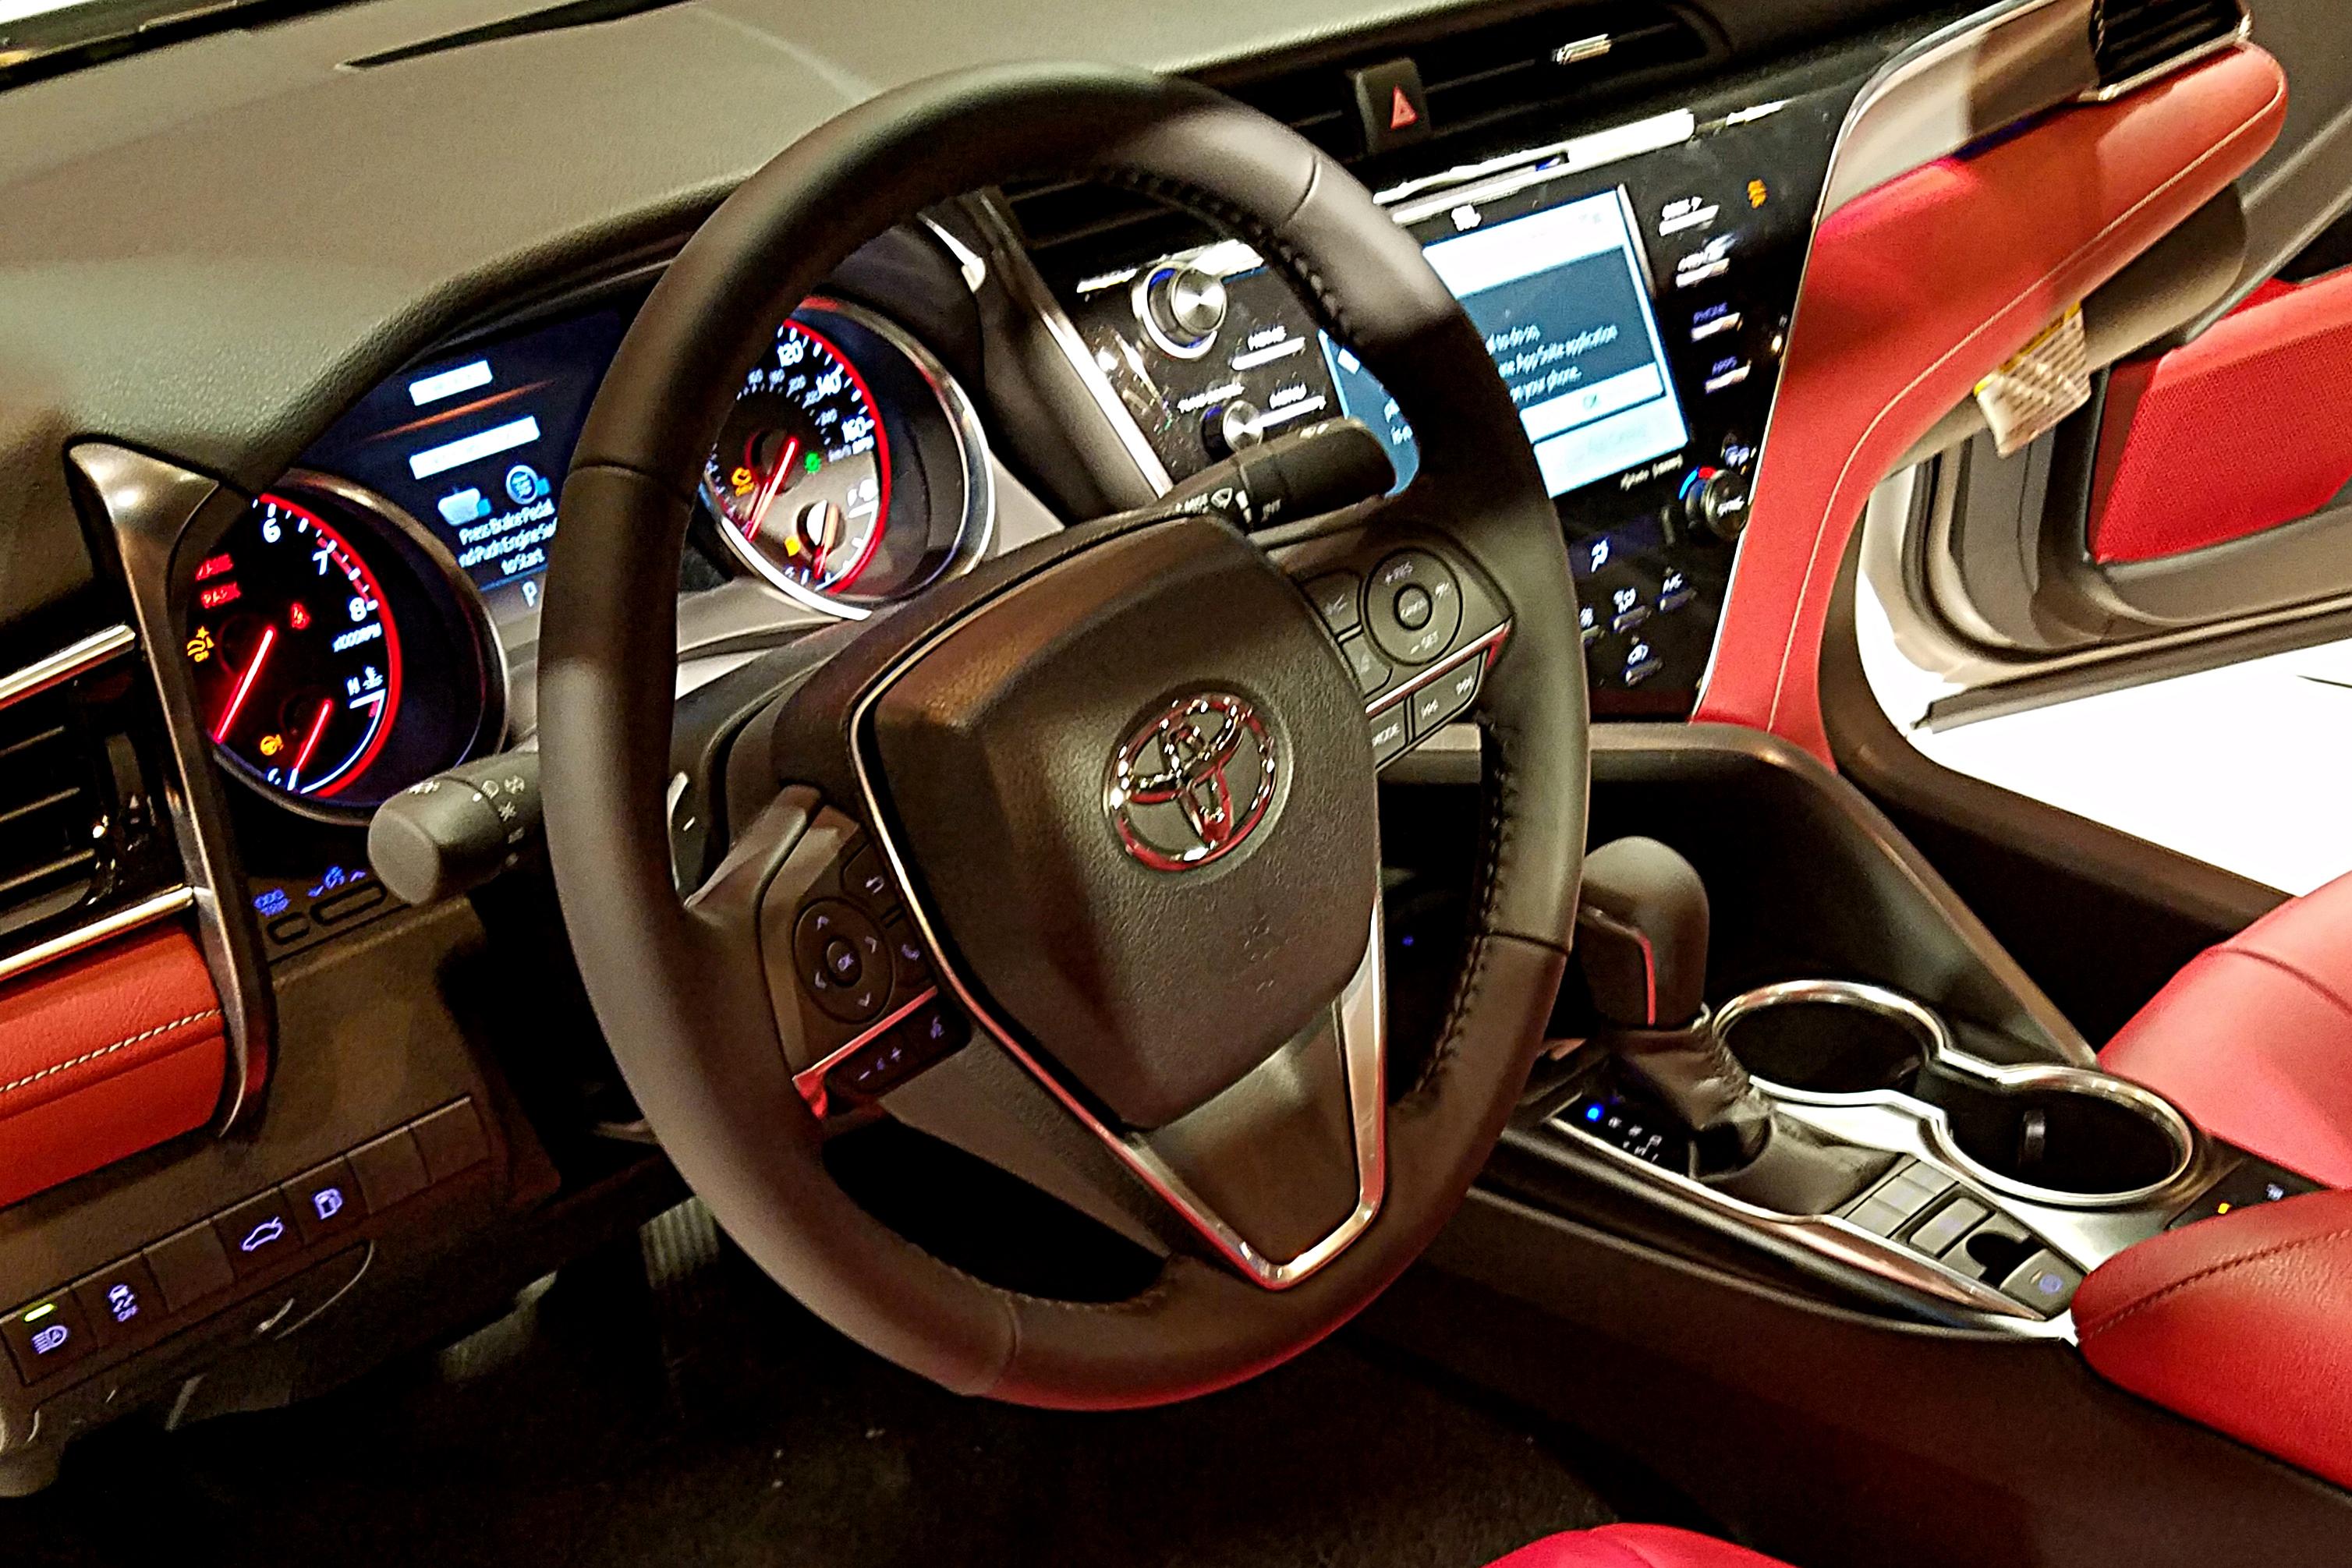 Toyota Camry 2018 Interior >> File 2018 Toyota Camry Interior Jpg Wikimedia Commons